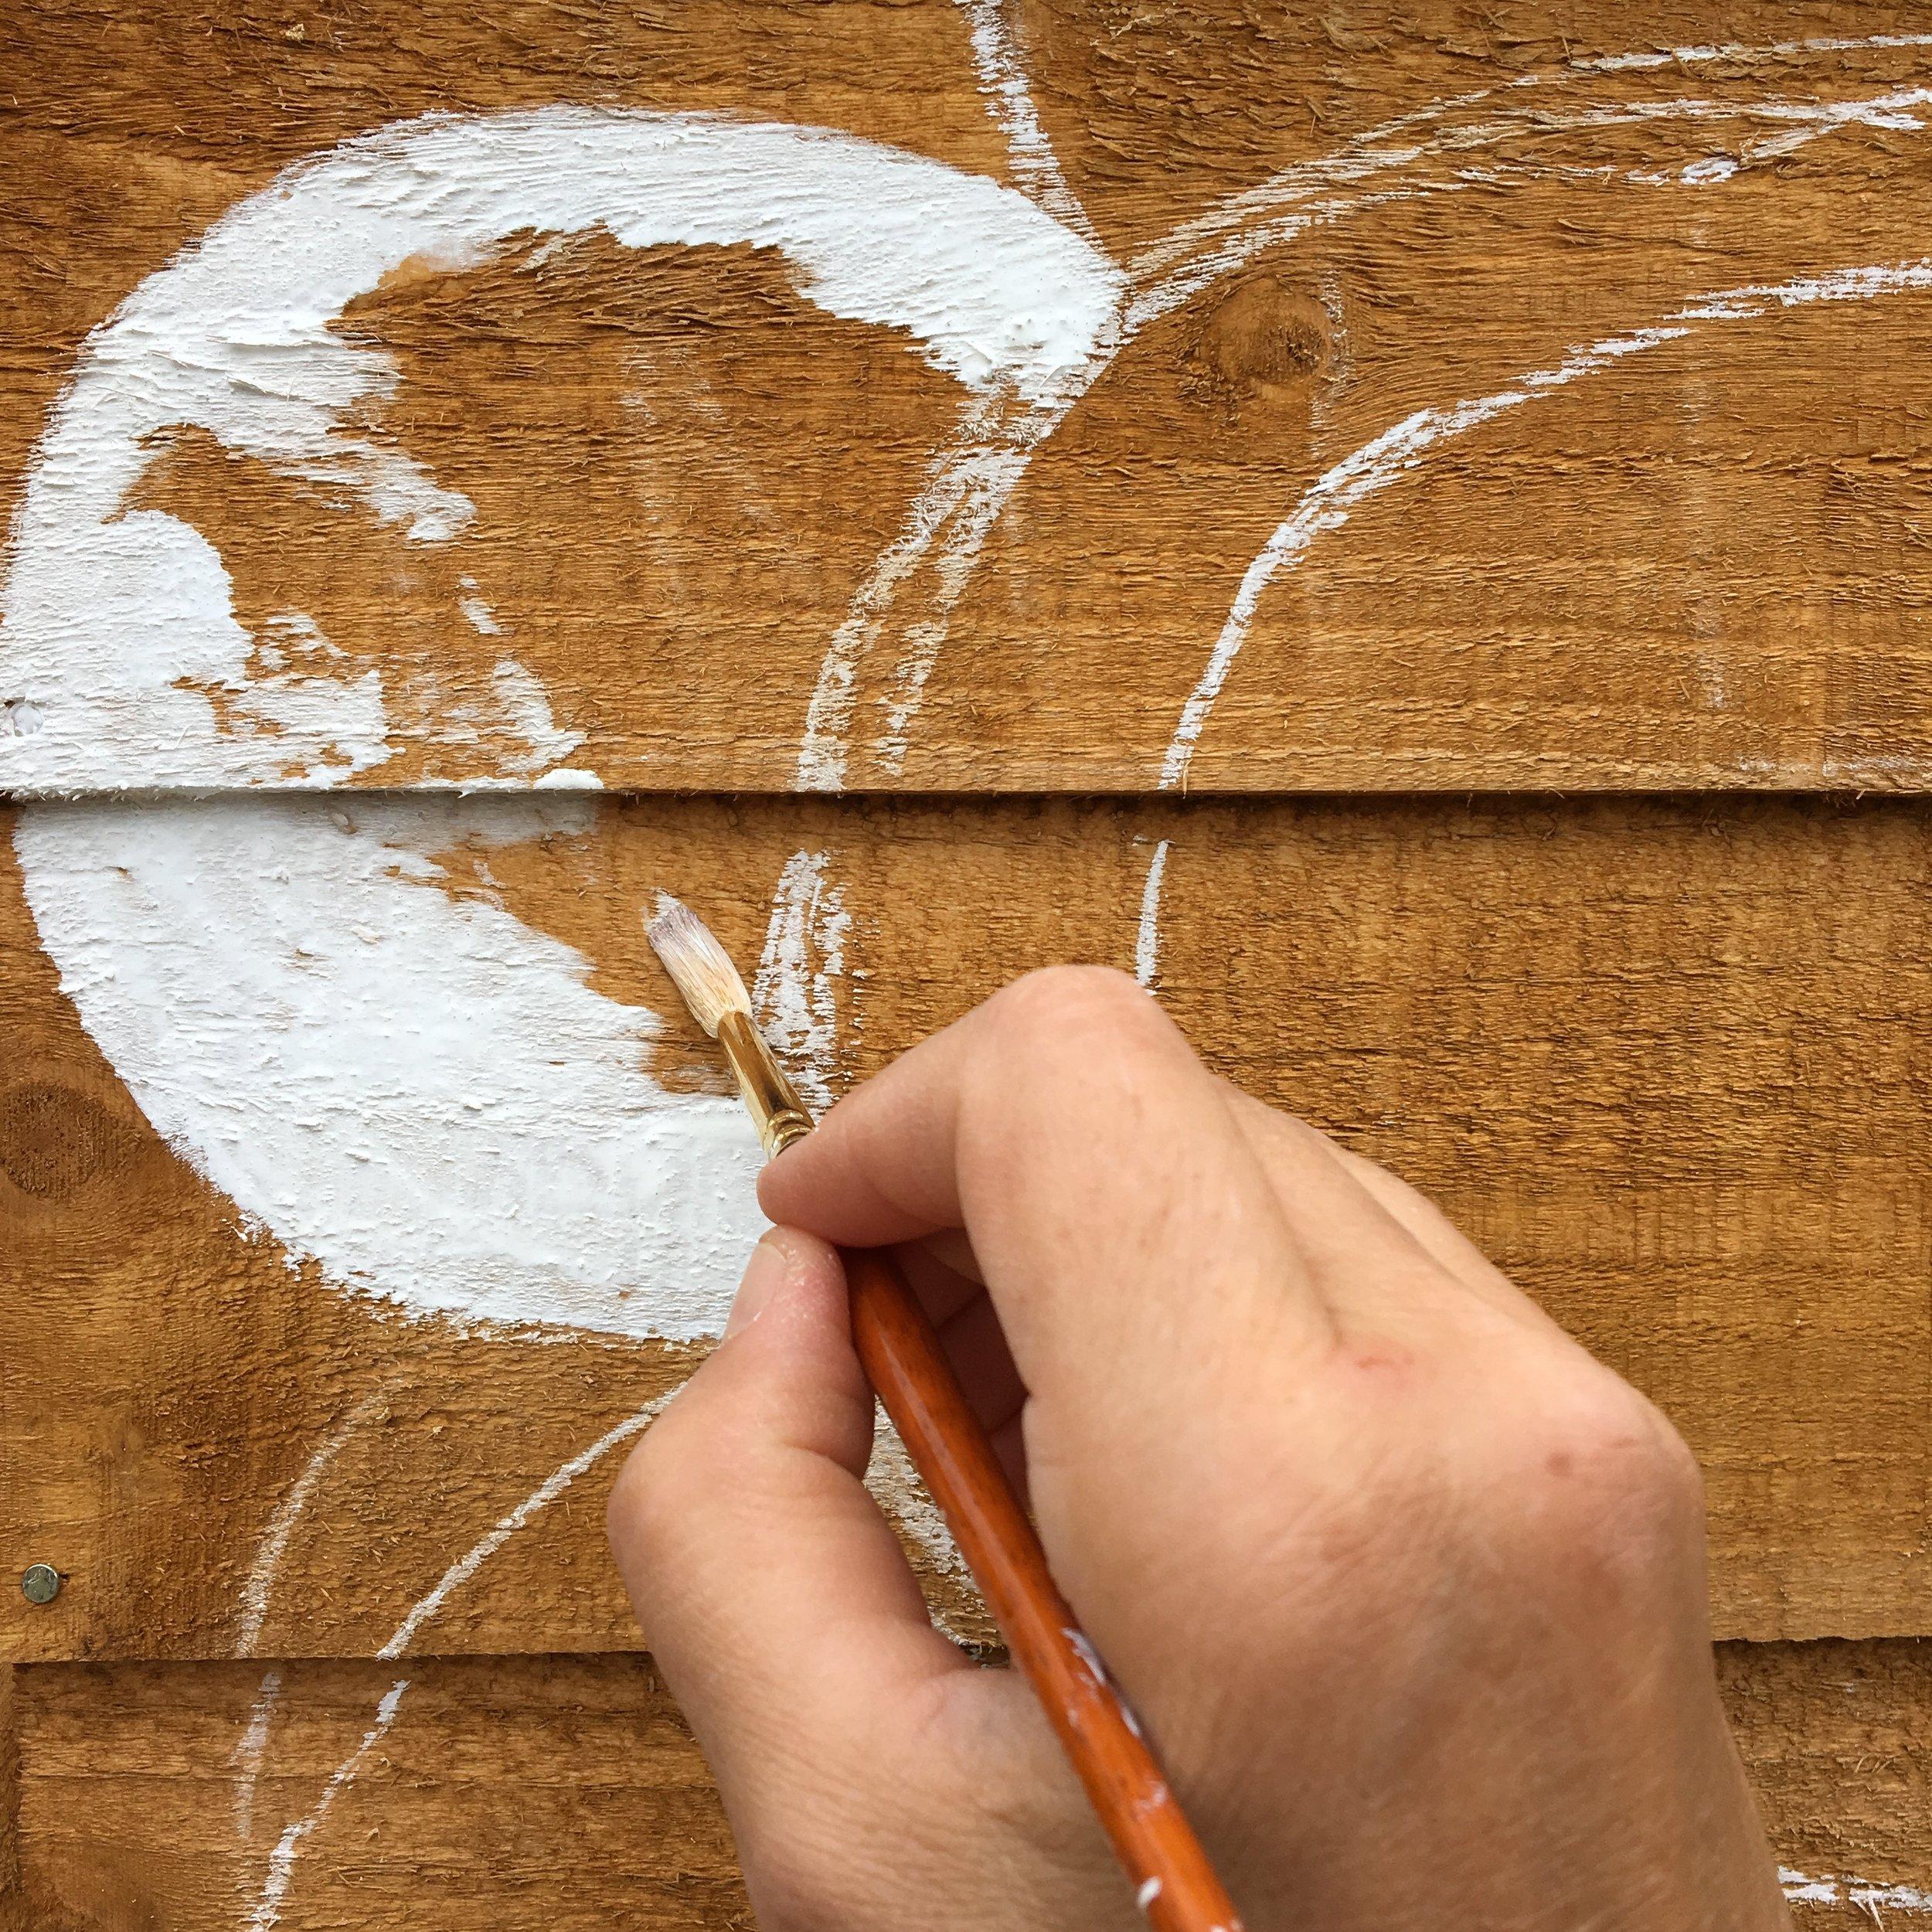 Painting the flower shape using Cuprinol's White Daisy shade of paint